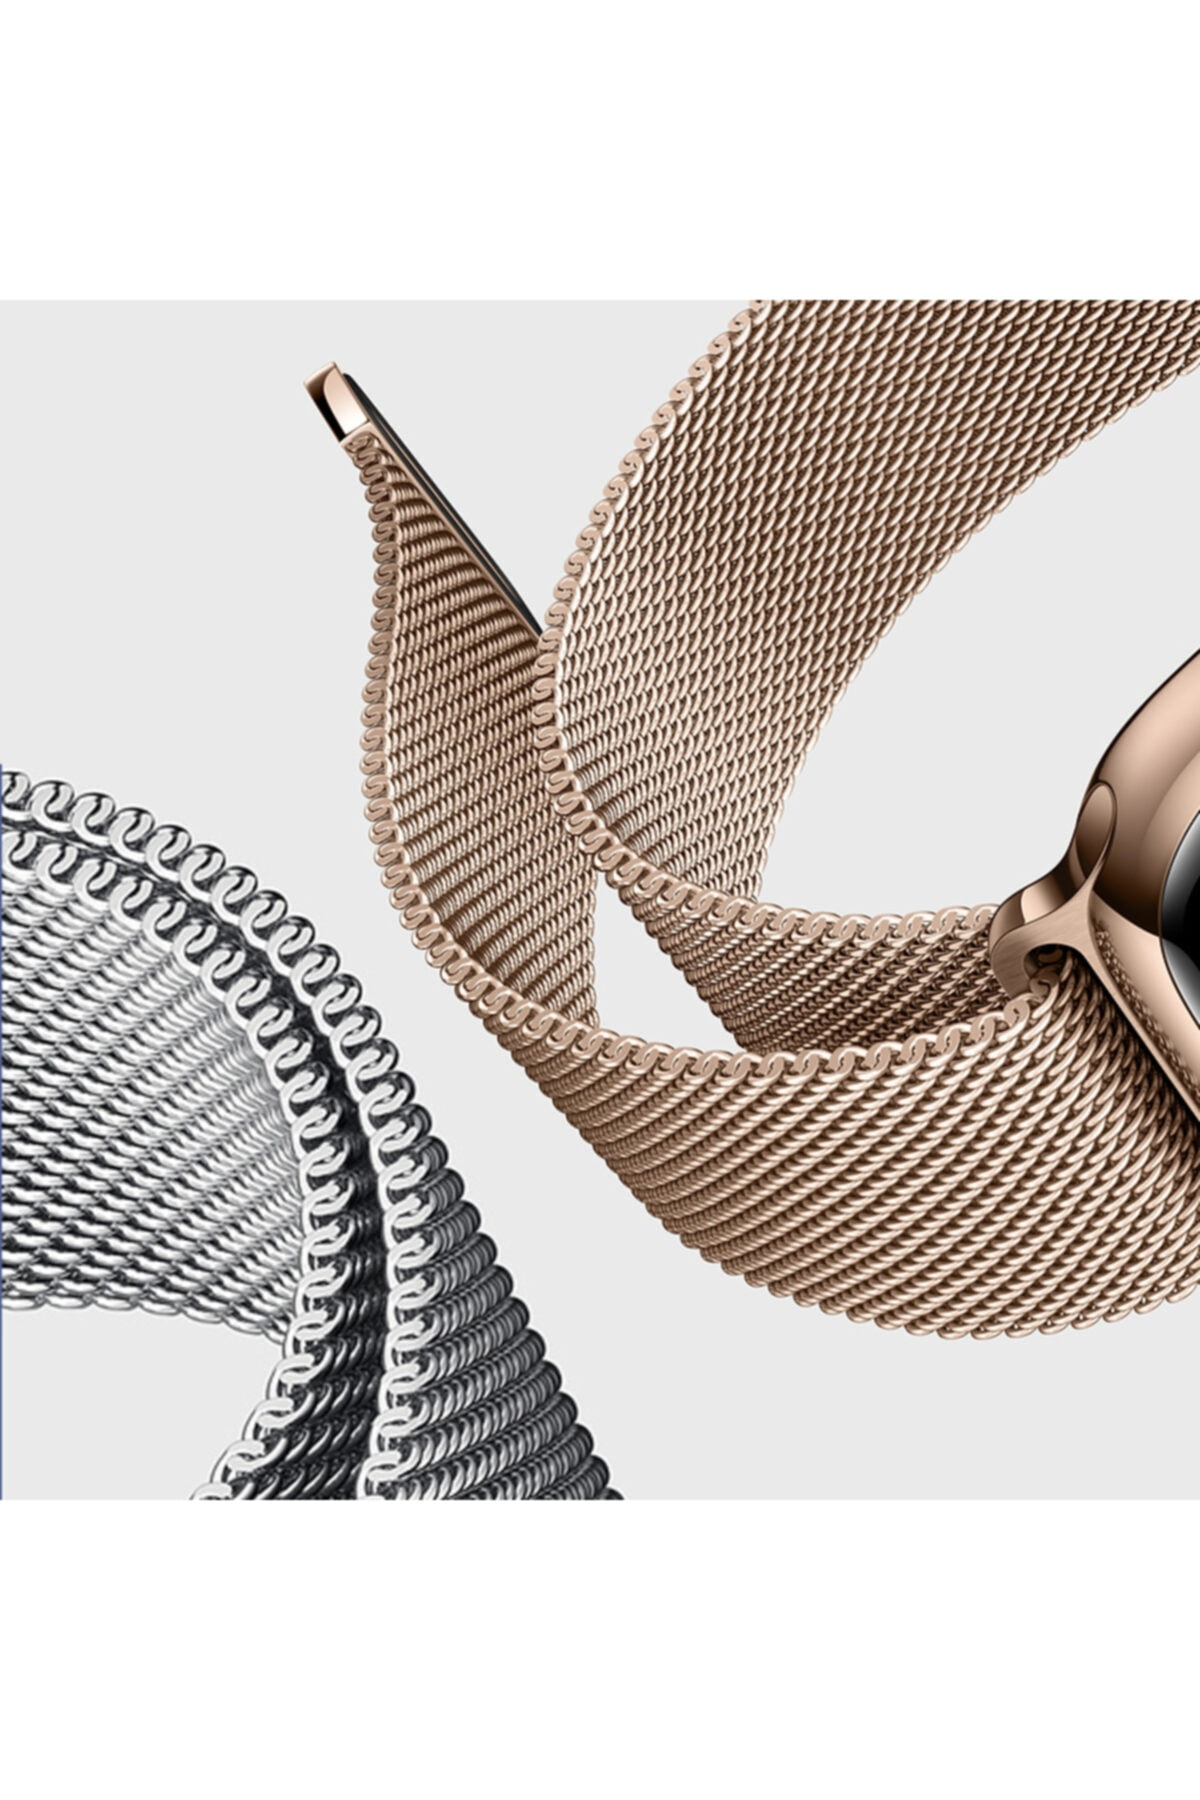 Microsonic Microsonic Watch Se 40mm Milanese Loop Kordon Rose Gold 2